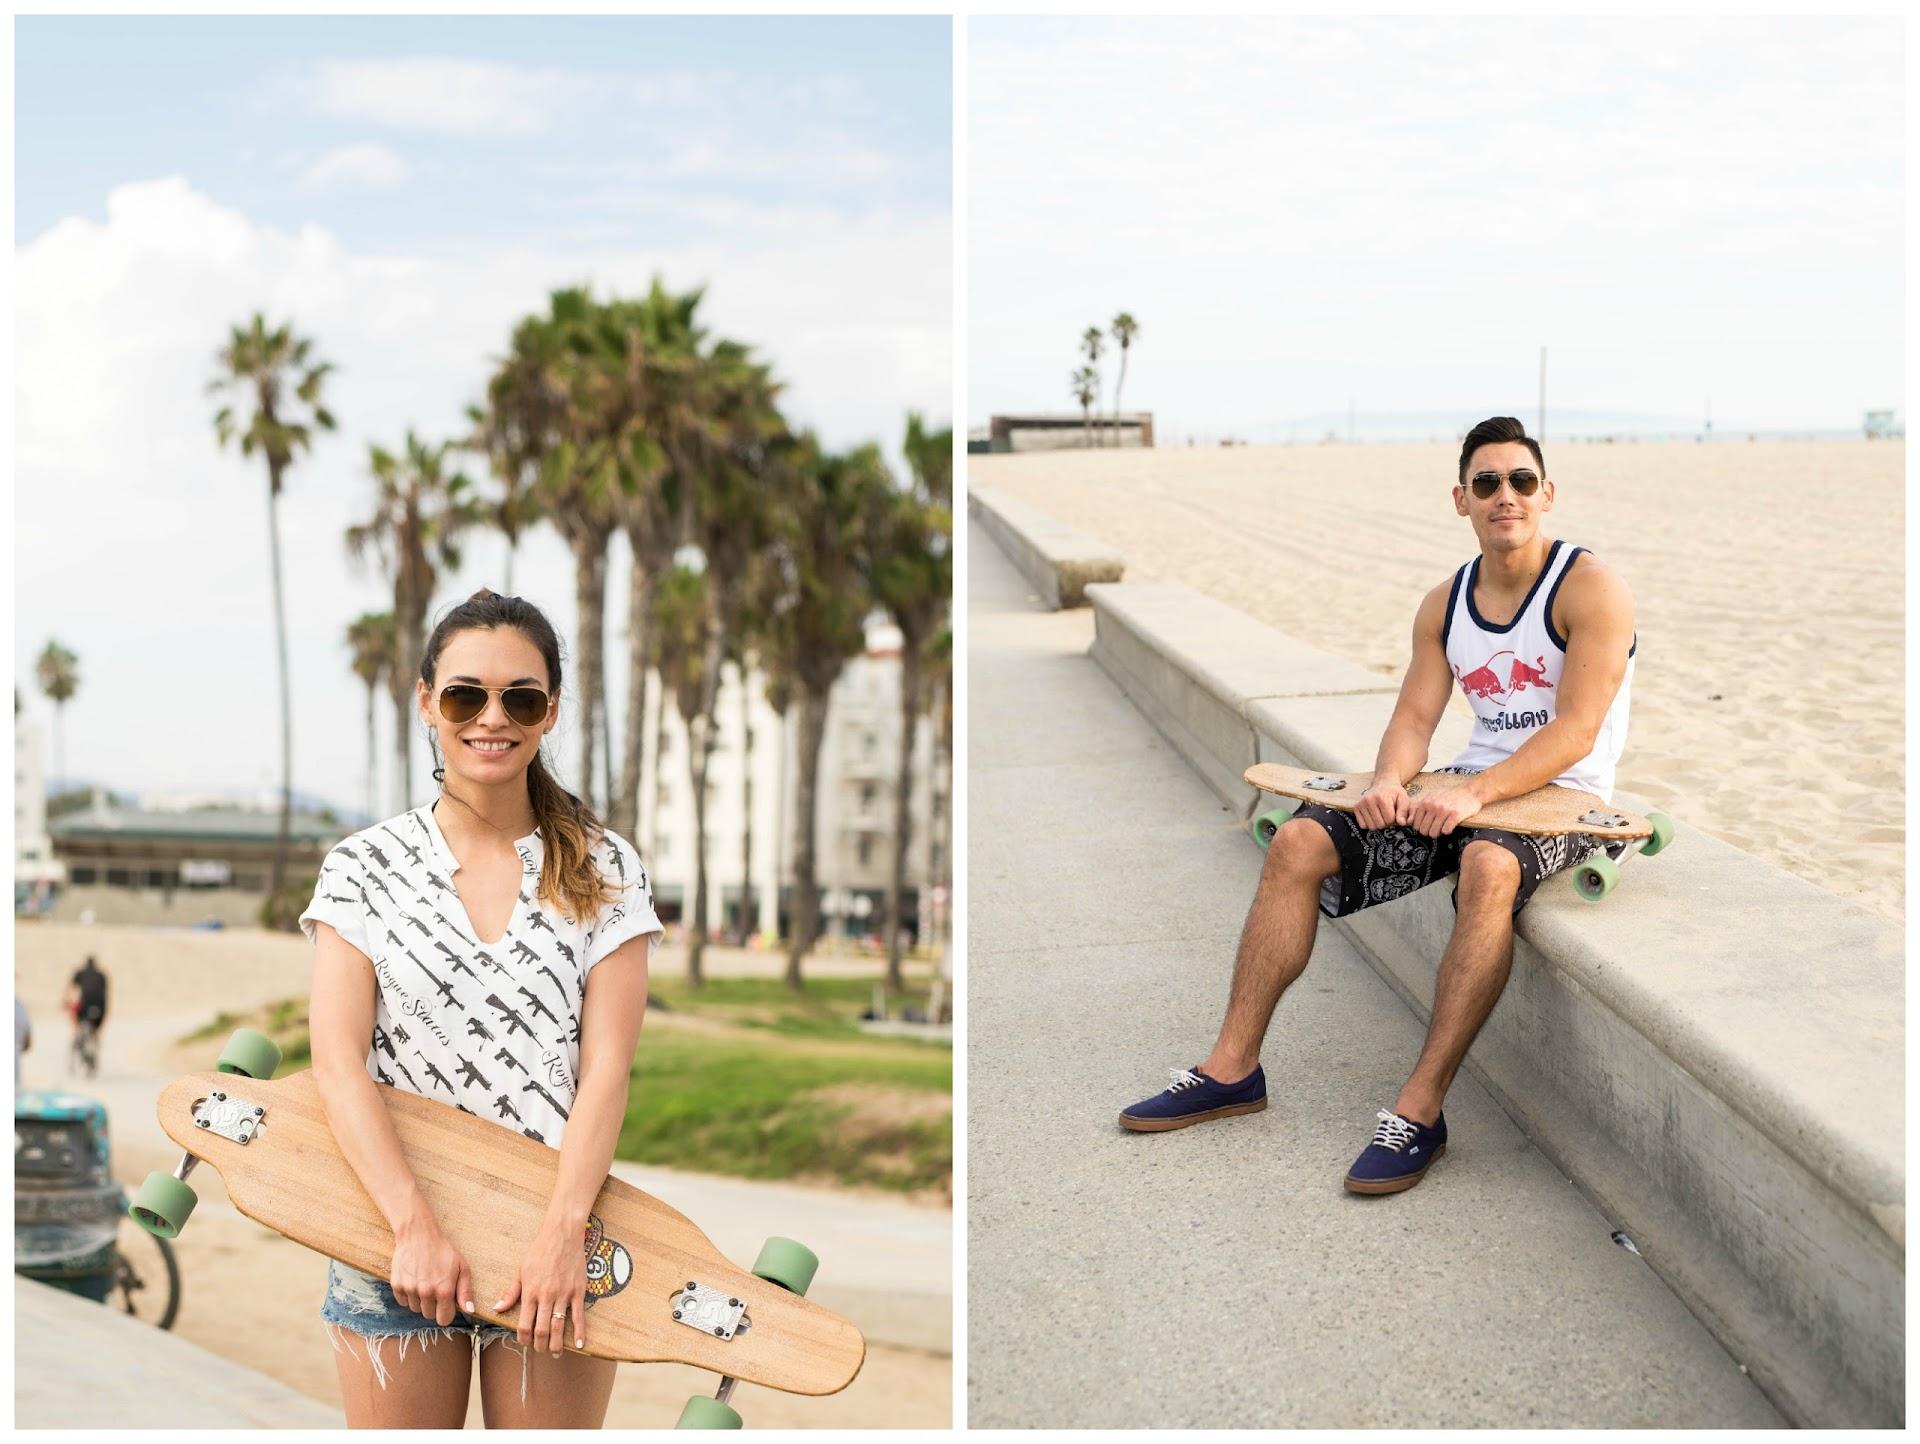 venice beach, skateboarding outfit, long boarding, sector 9 long board, skate park, asian, blogger, norcal